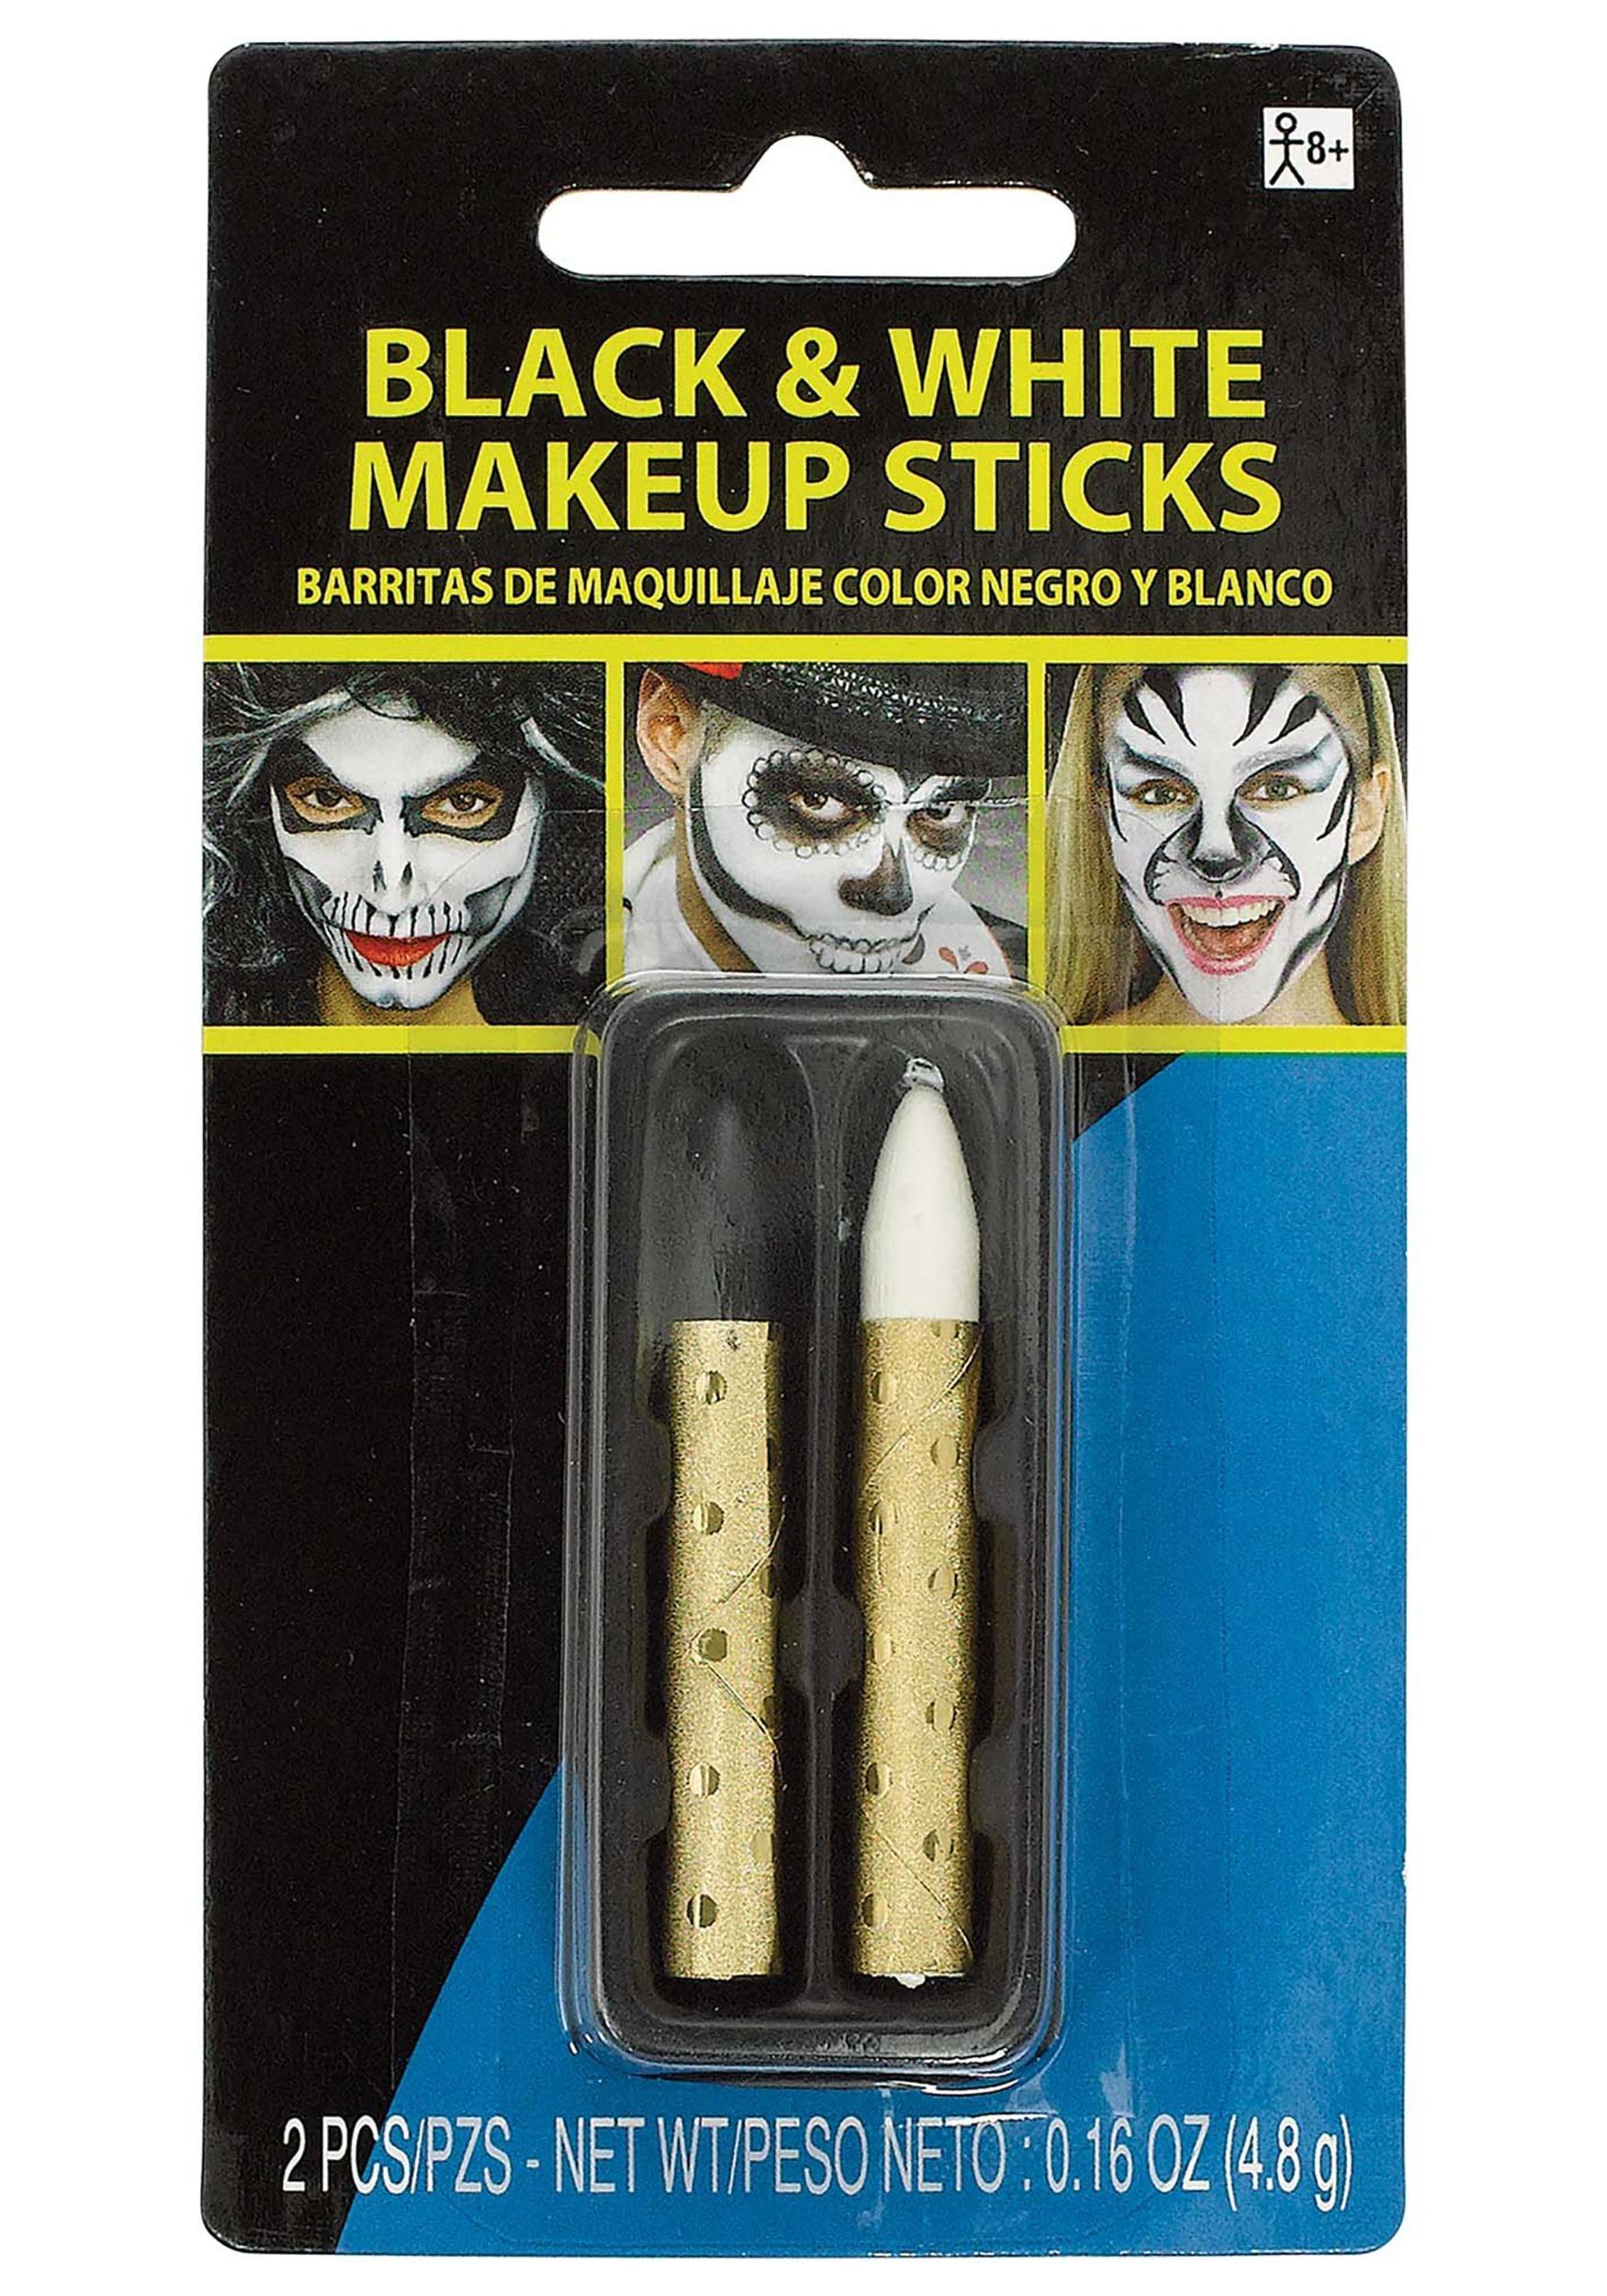 Makeup_Sticks_Black_and_White